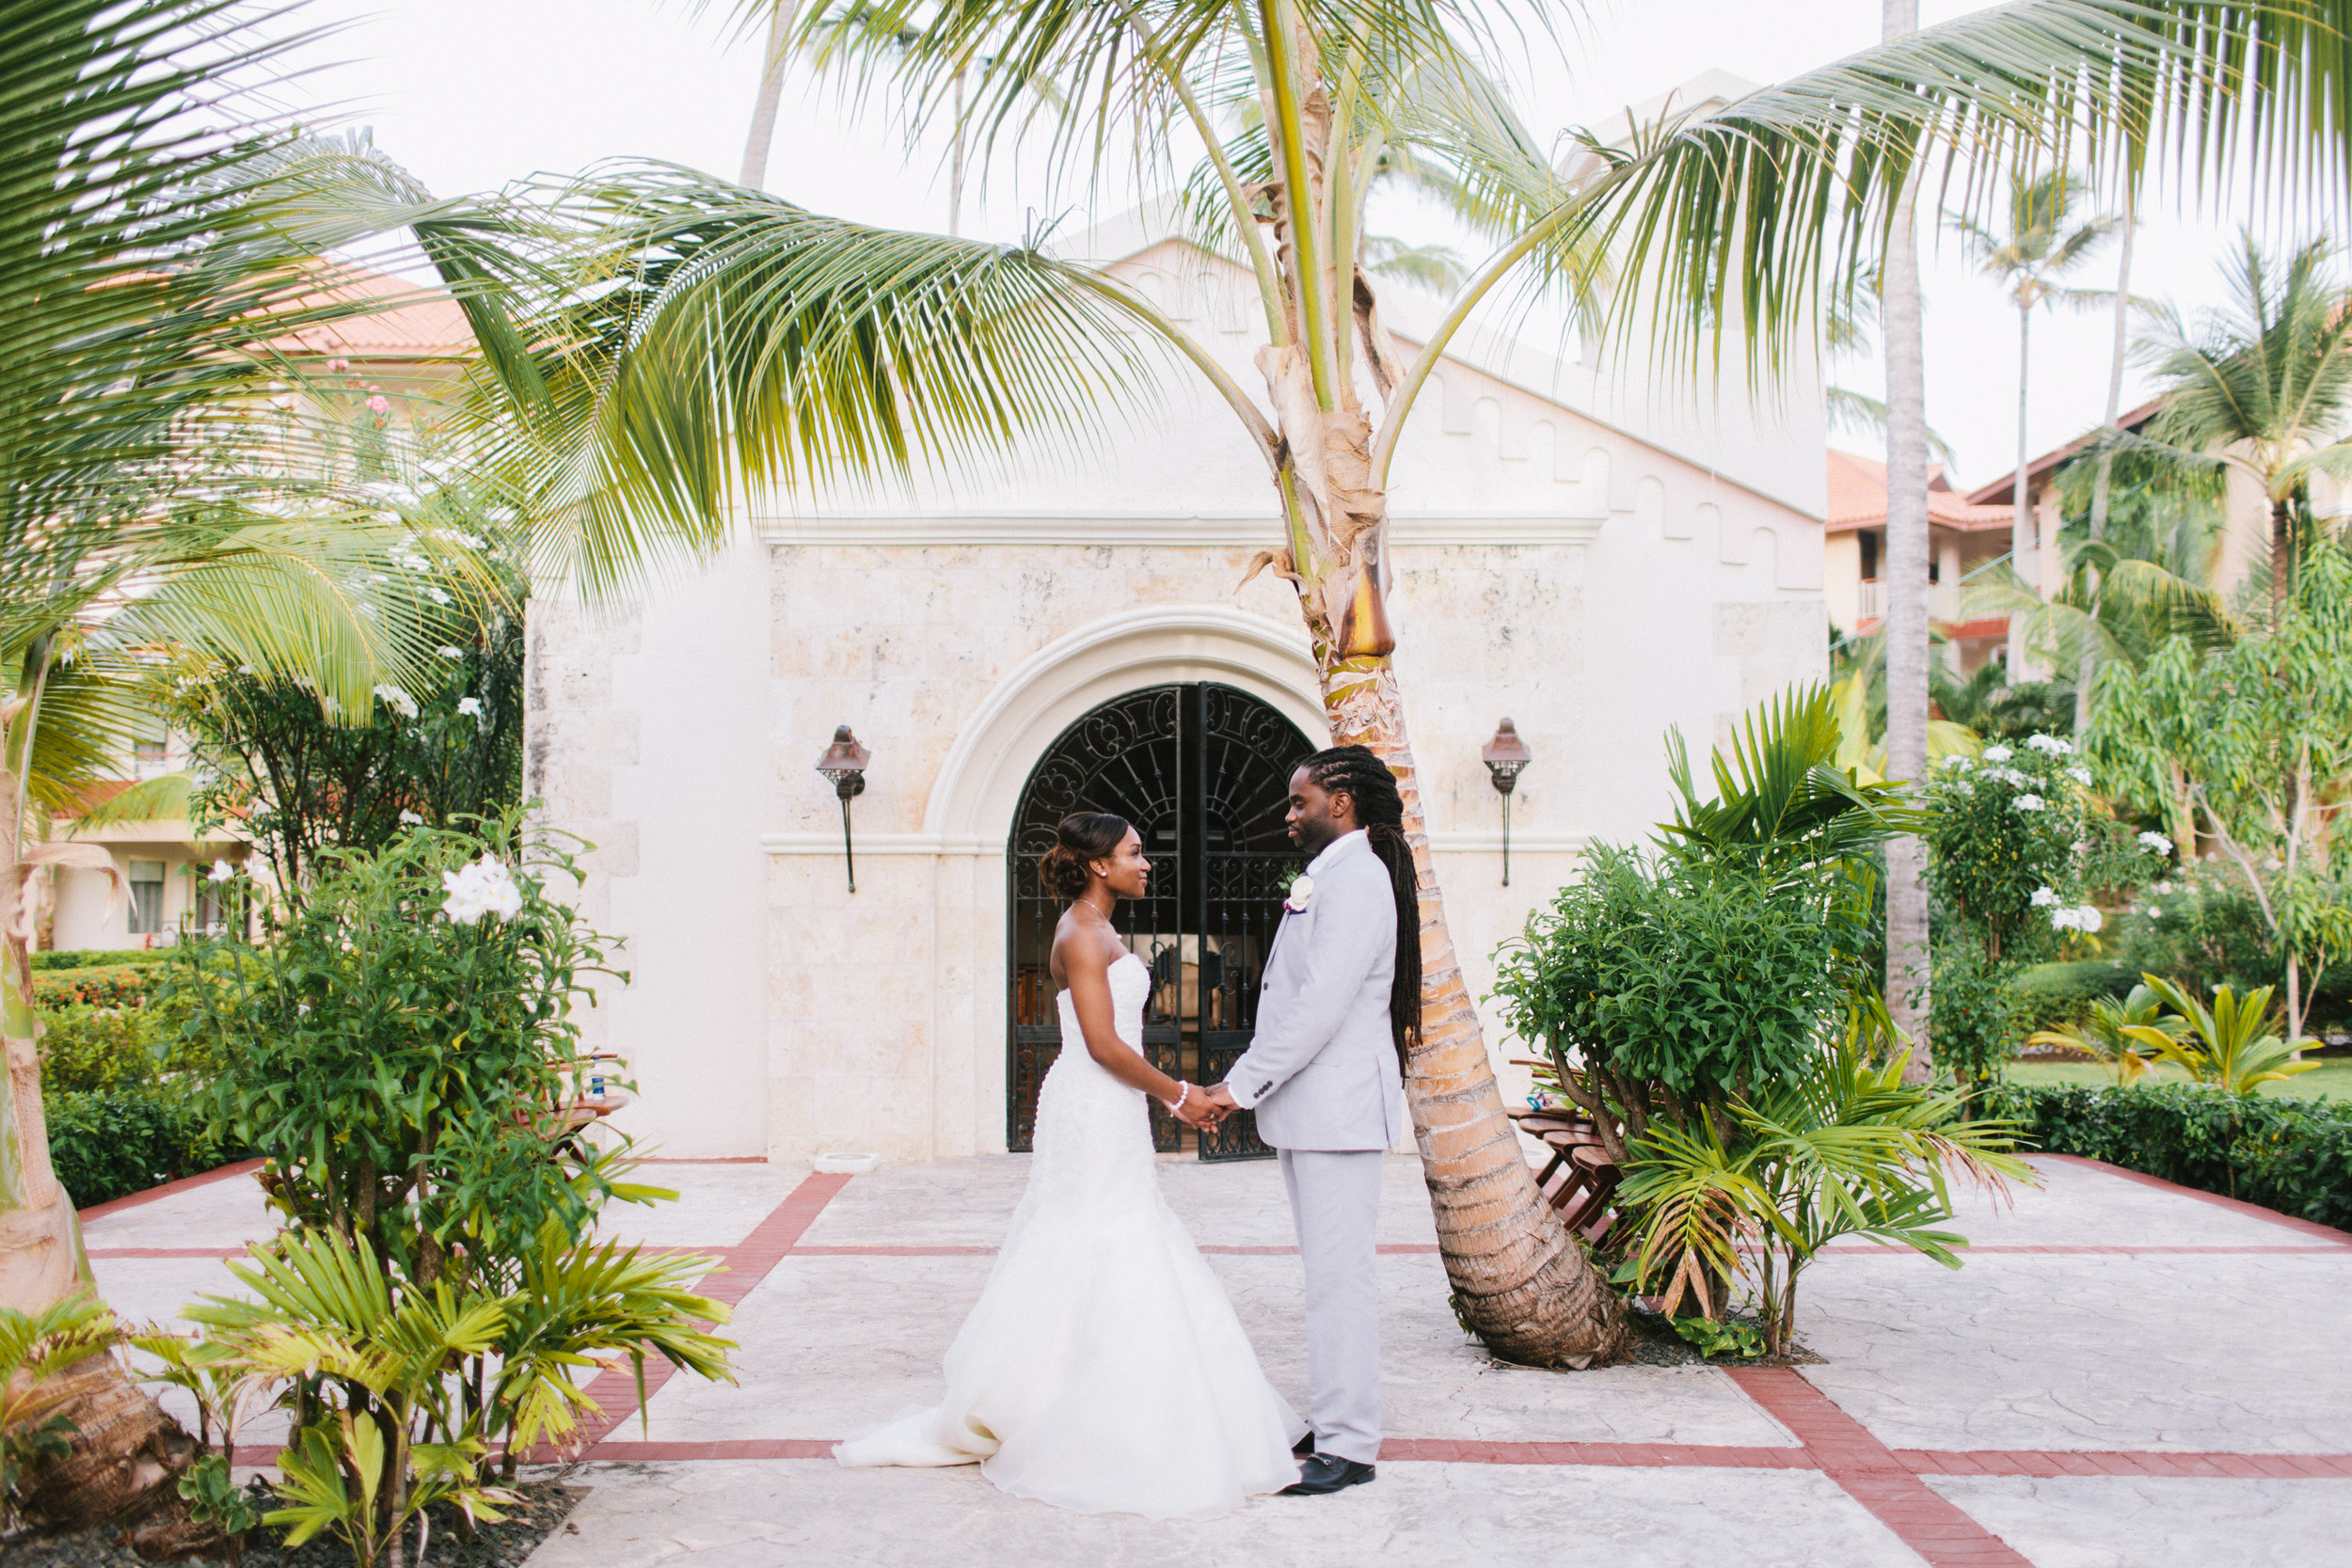 michael-rousseau-photography-dominican-republic-destination-wedding-cara-jason-colonial-majestic-dominican-republic110.jpg